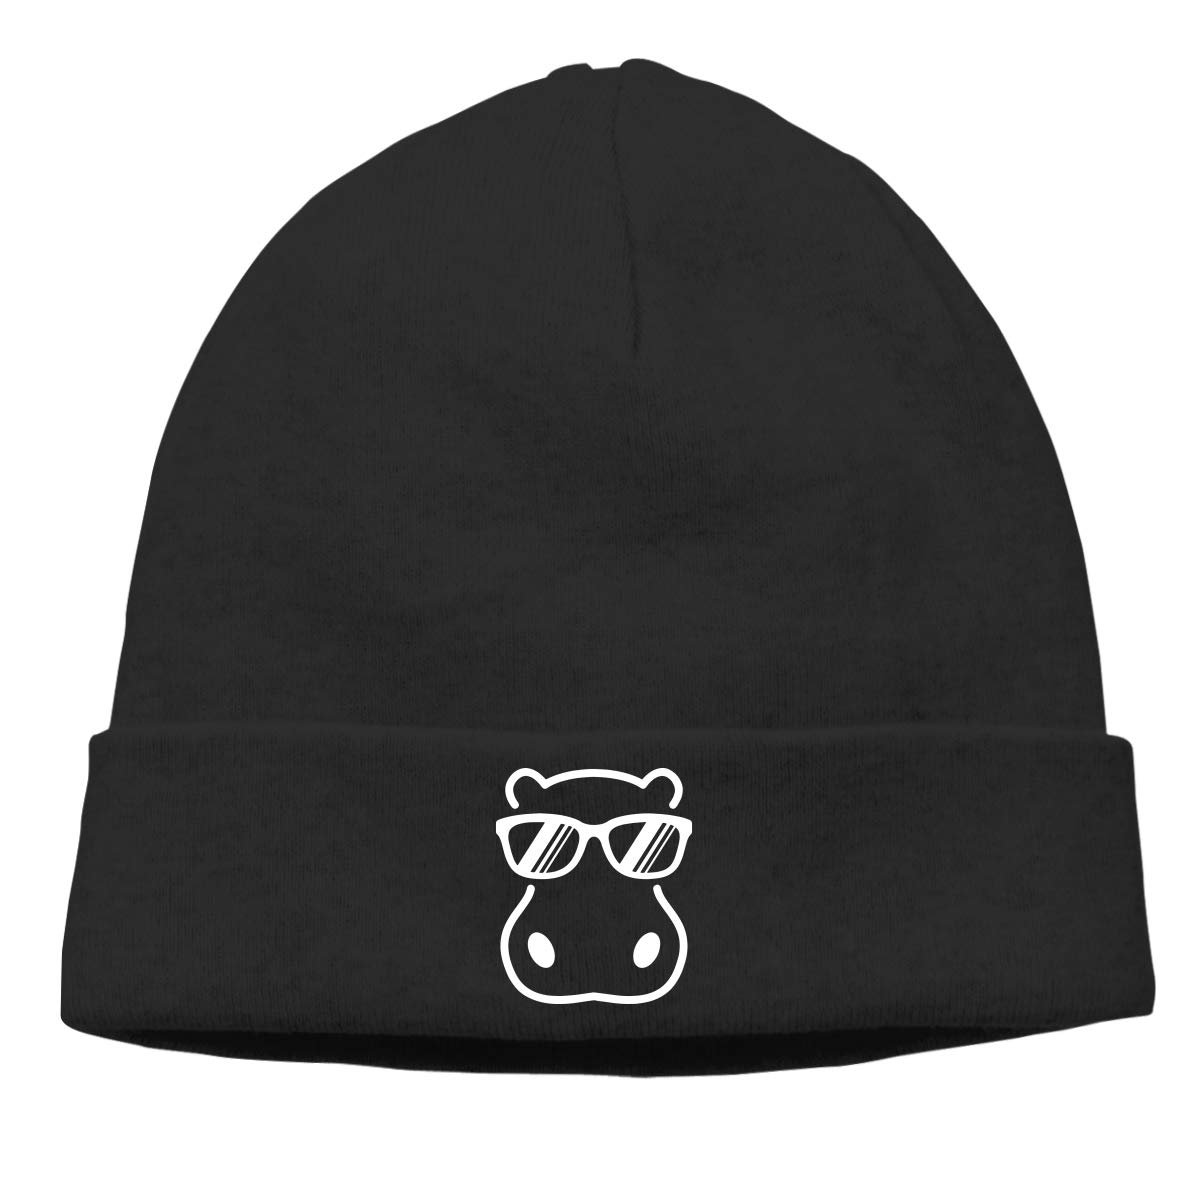 Sootot Hippopotamus Wearing Sunglasses Beanie Hats Cap Men /& Women Warm /& Stylish Skull Cap Winter Hats